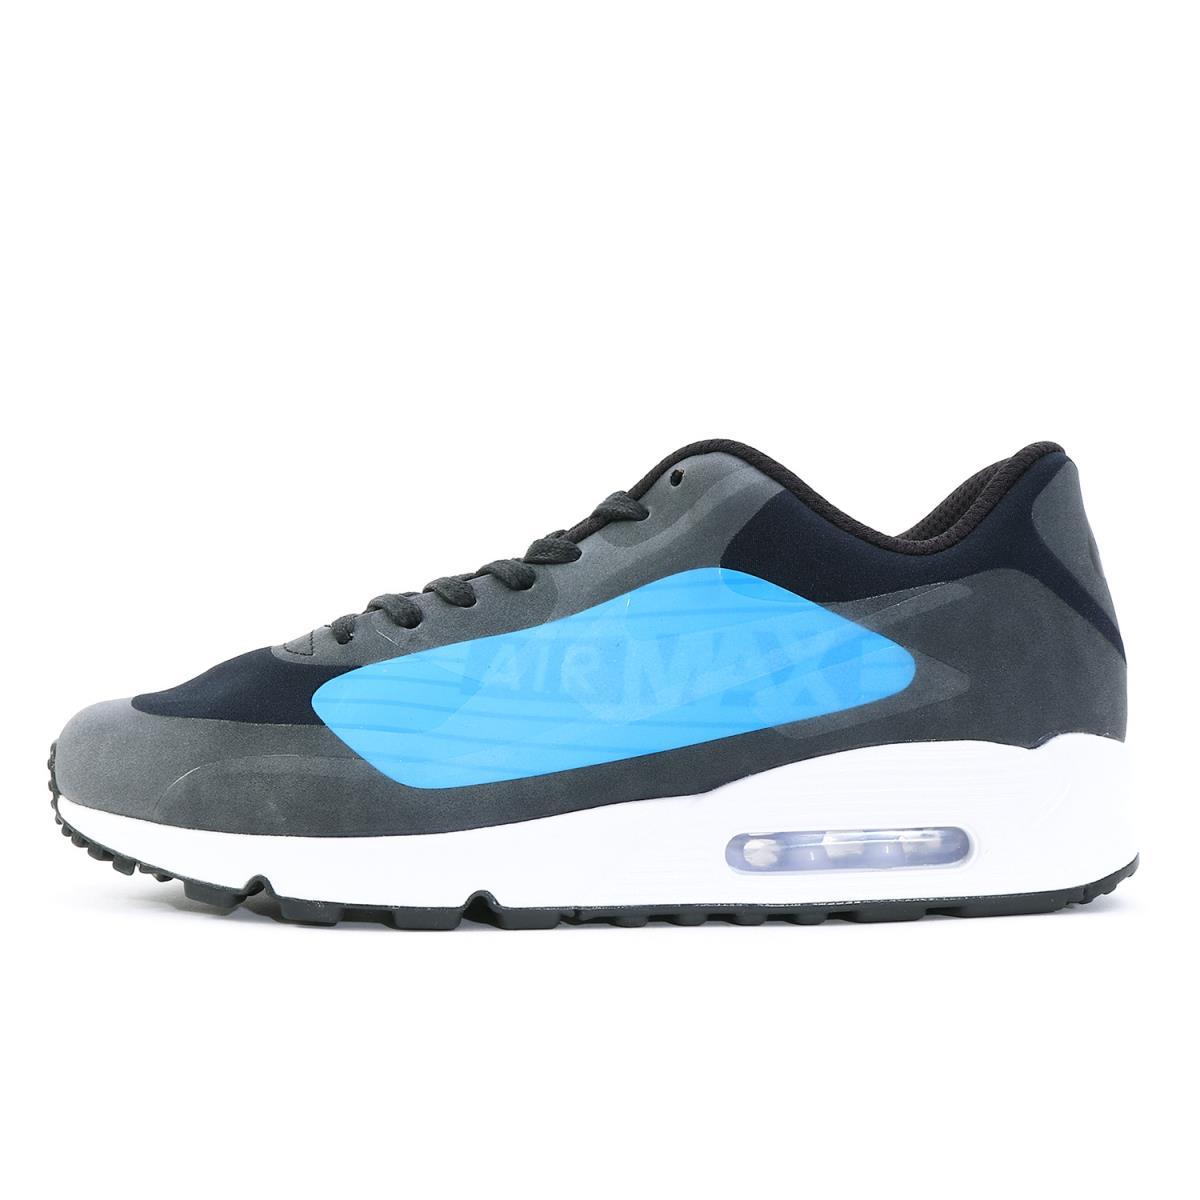 size 40 d1ffa 8df75 NIKE (Nike) AIR MAX 90 NS GPX (AJ7182-001) black X laser blue US9.5(27.5cm)